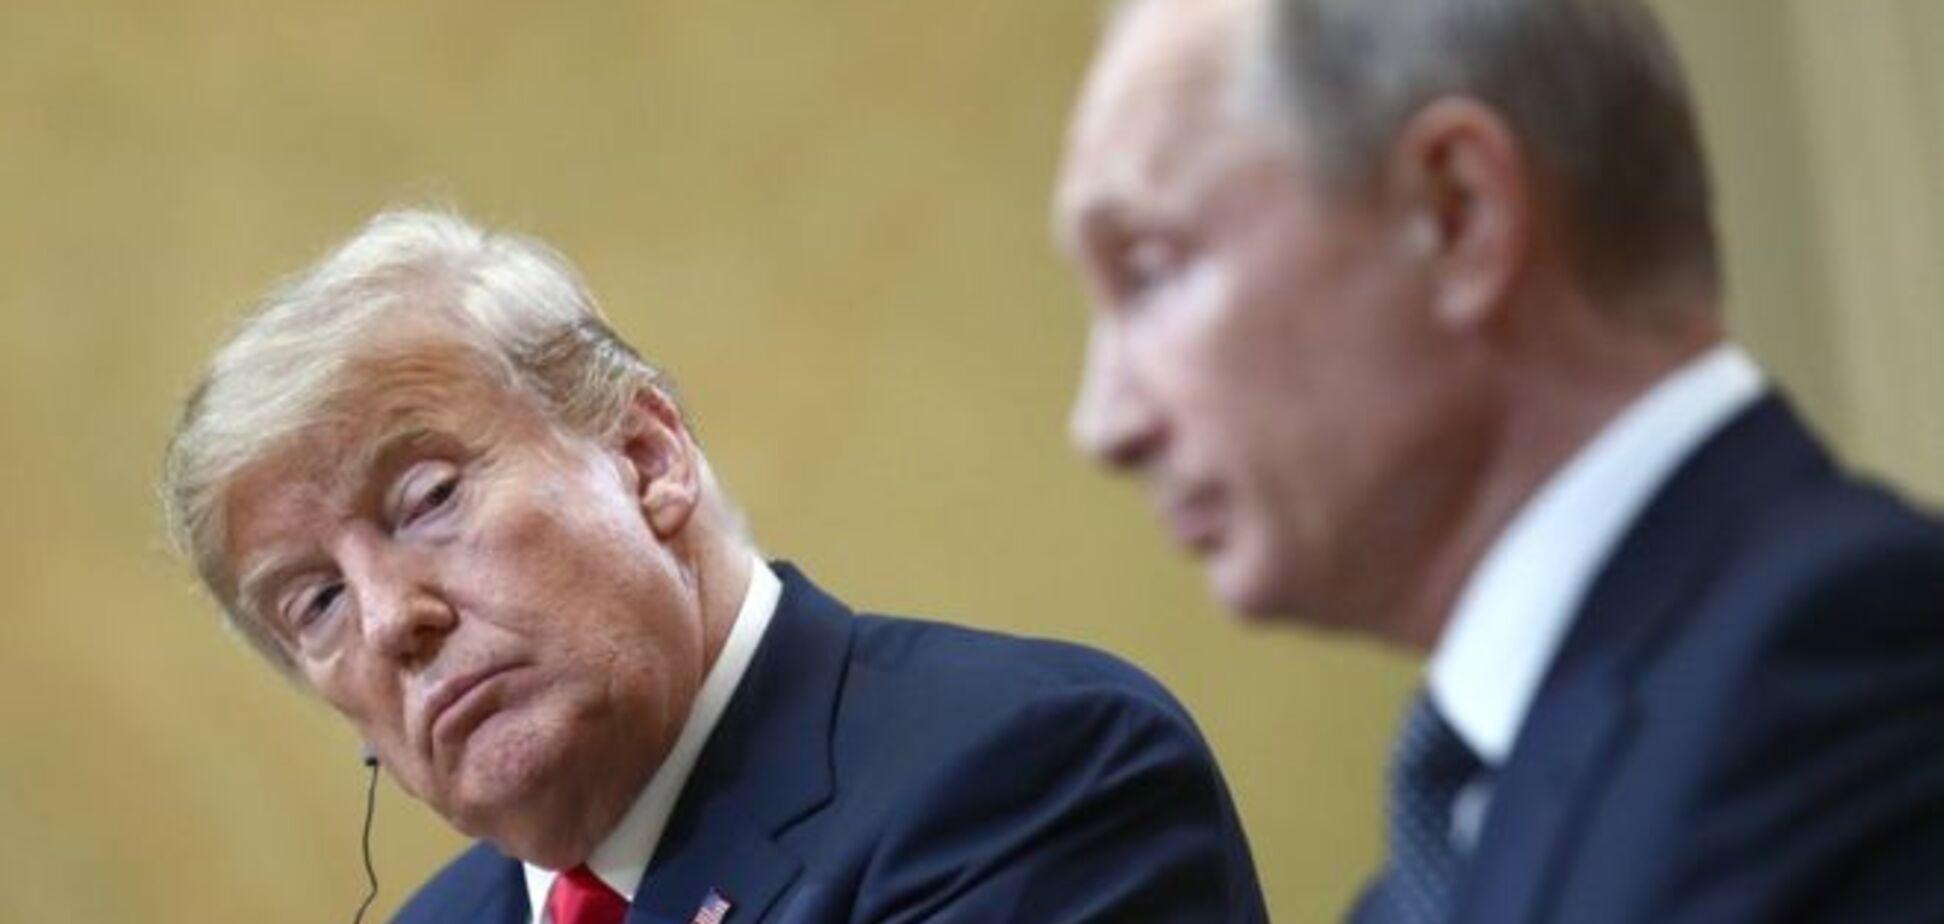 Путин победил: Альберт Фельдман о Трампе - не волшебнике